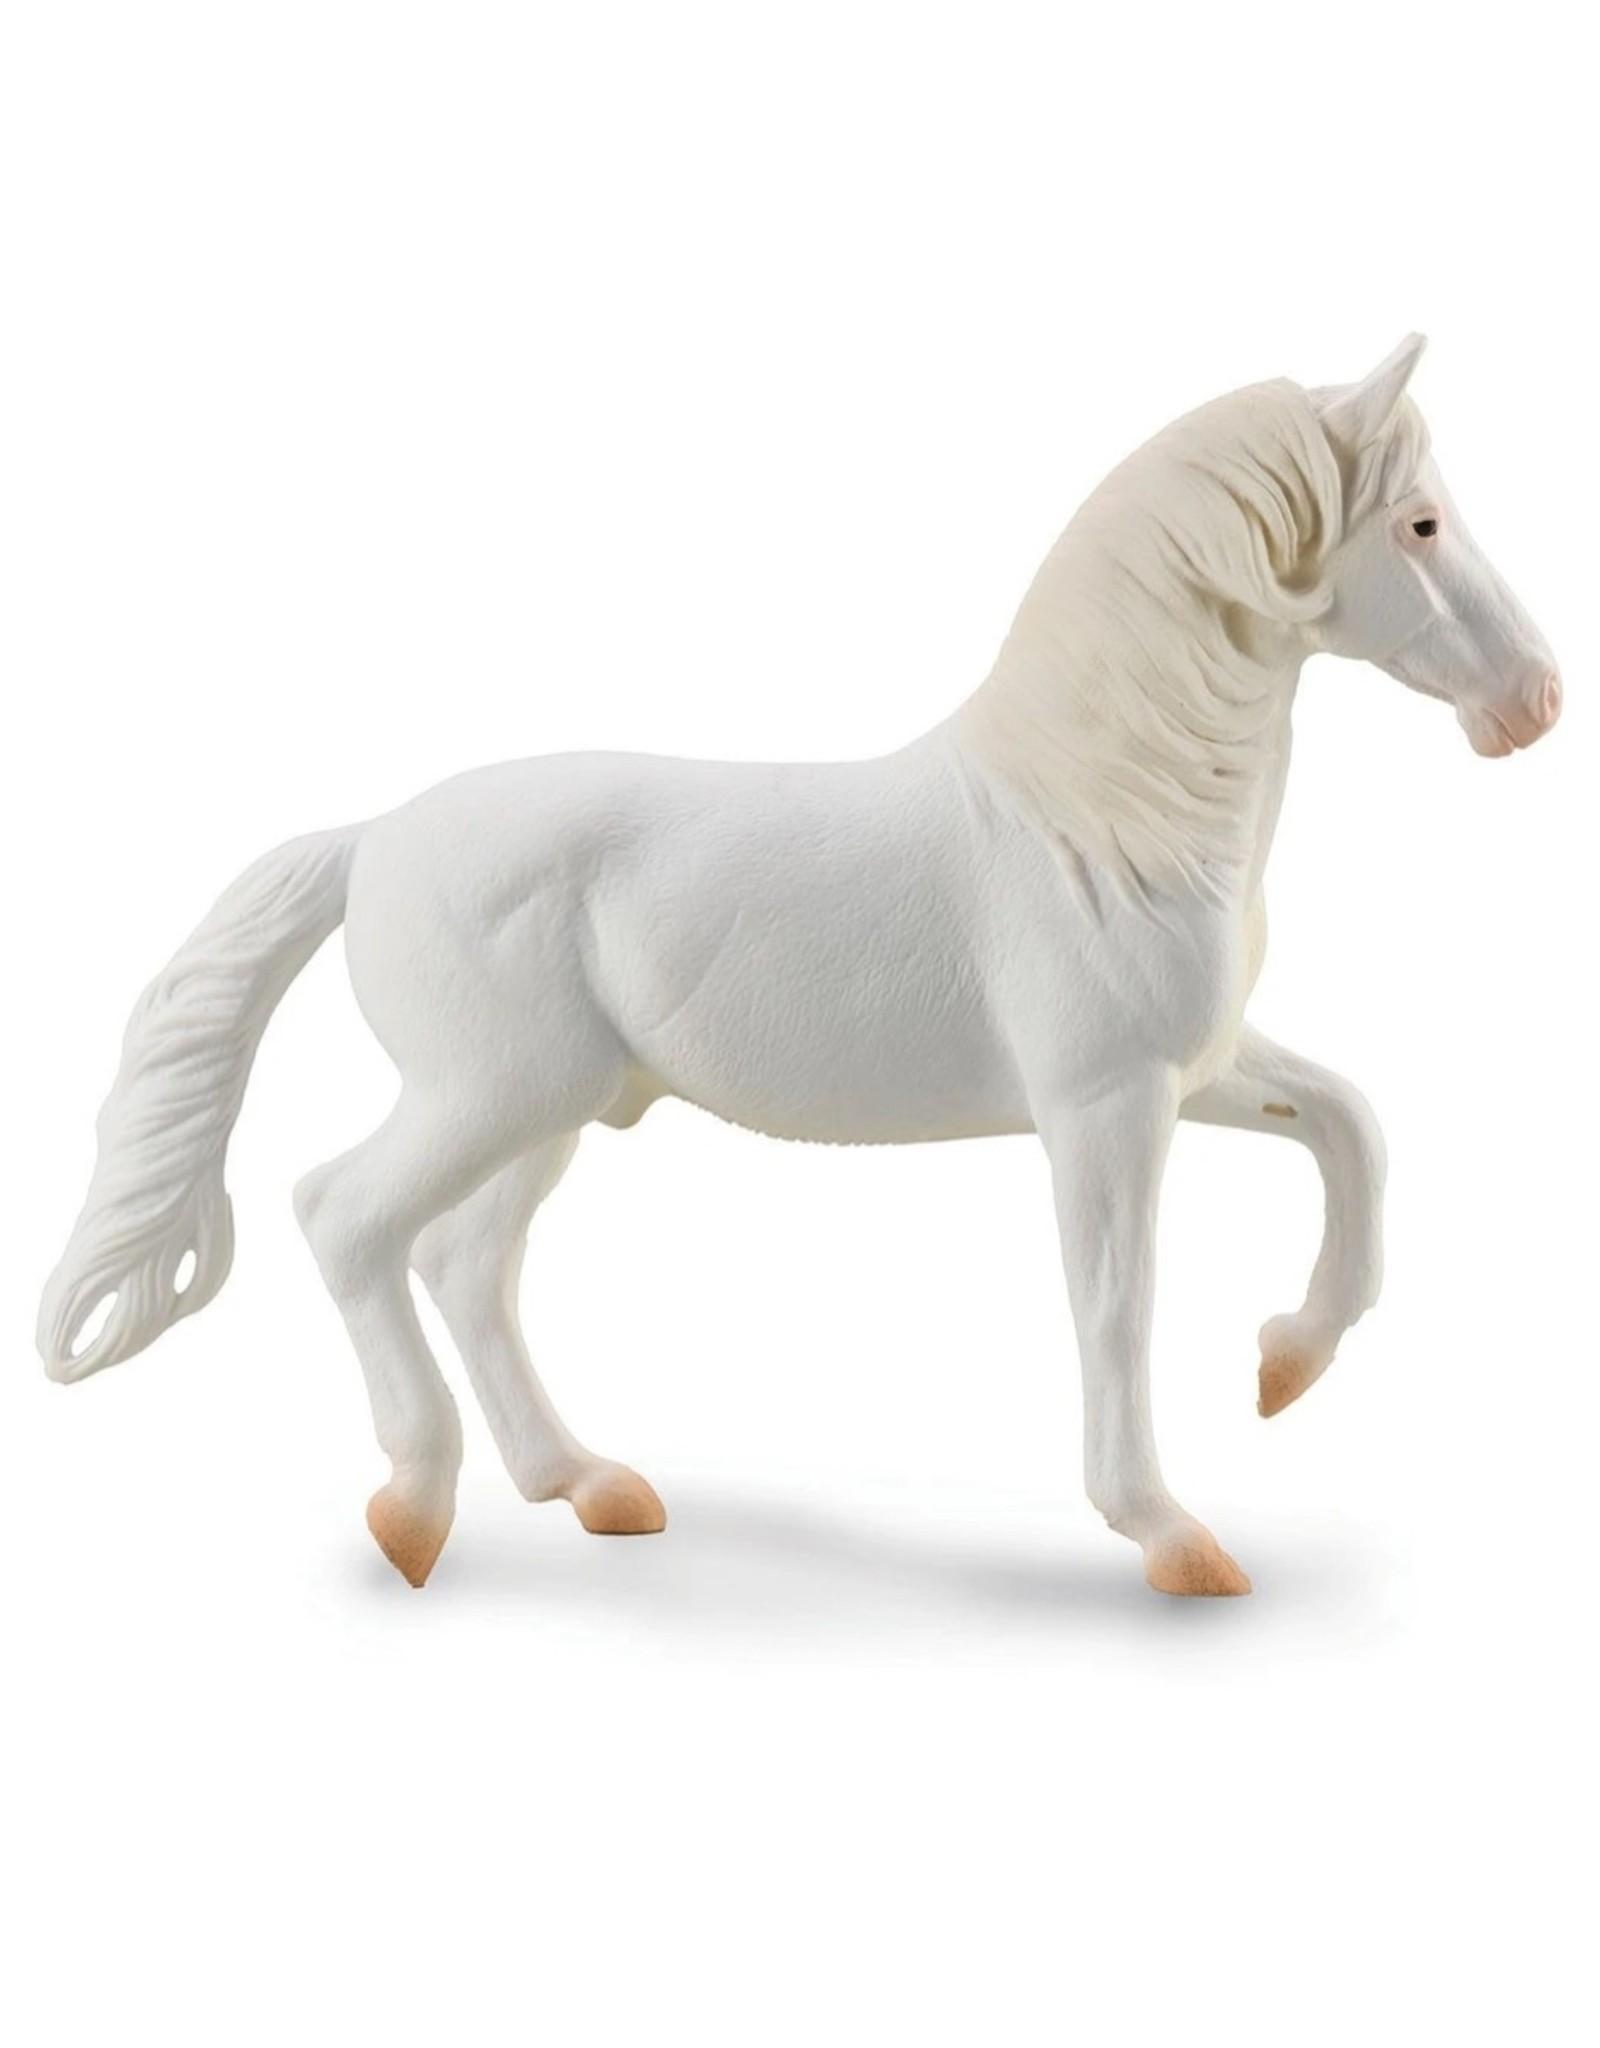 Breyer Camarillo White Horse